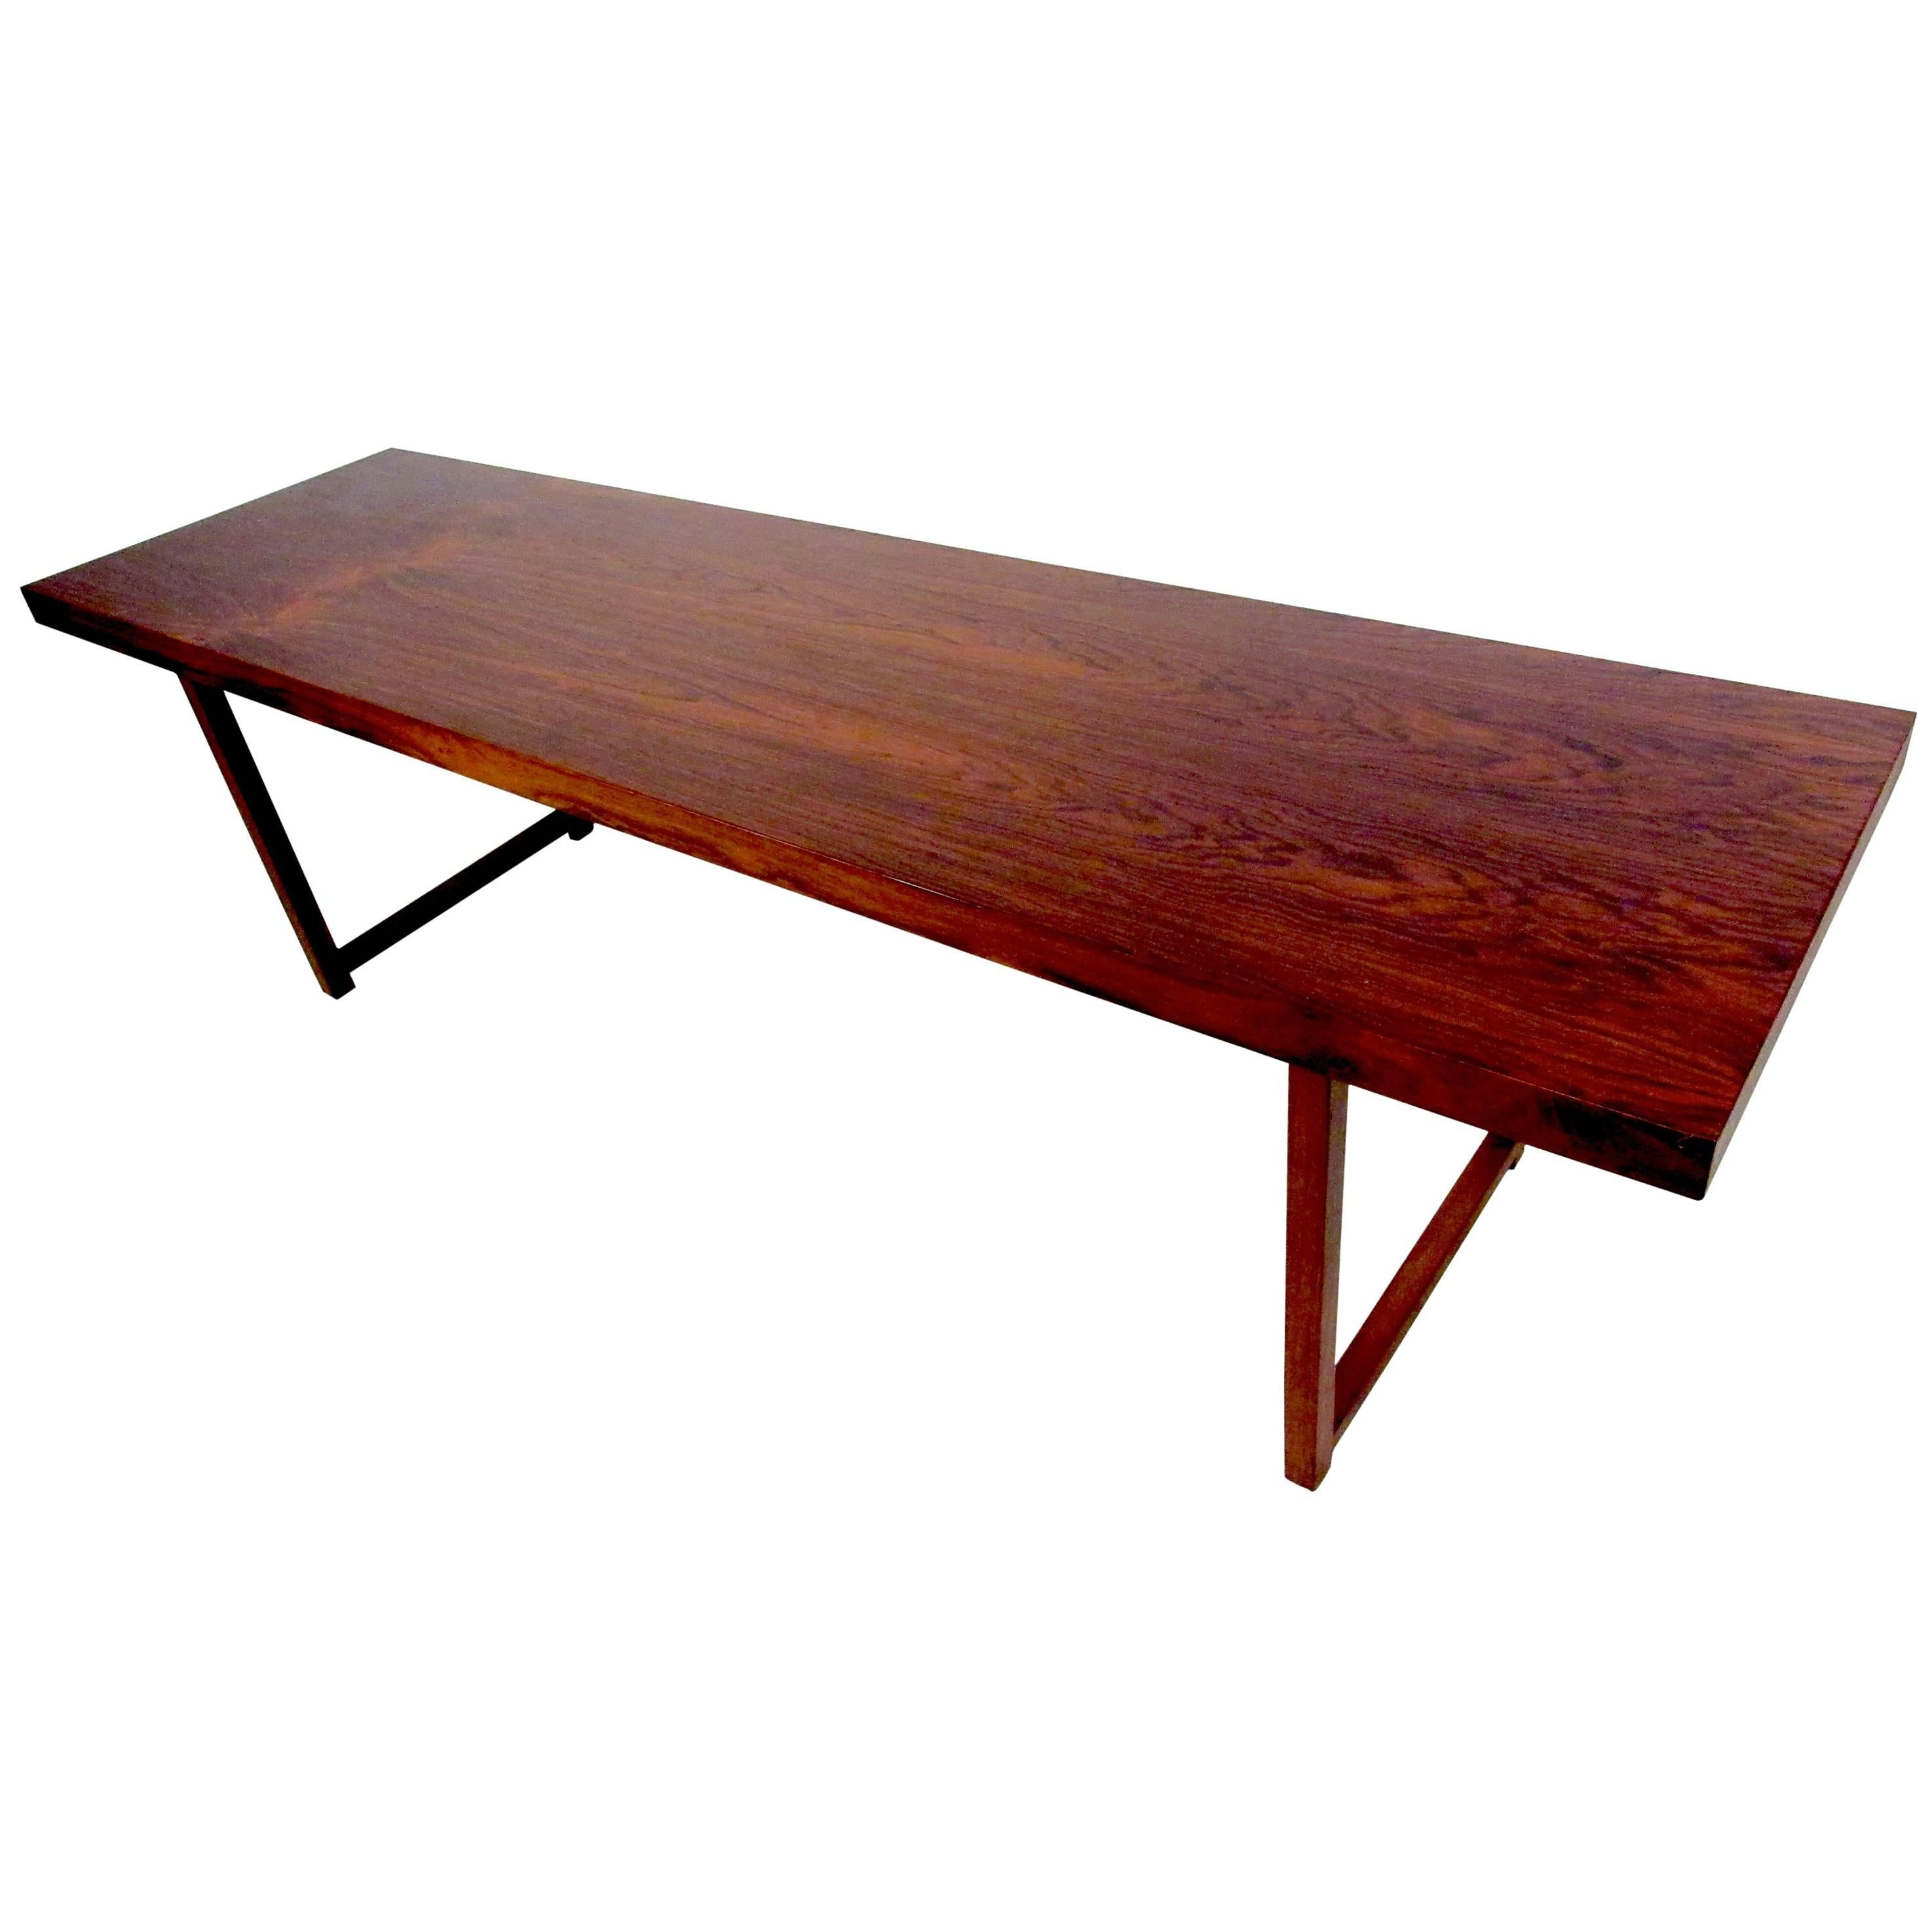 Milo Baughman Rosewood Coffee Table for Thayer Coggin